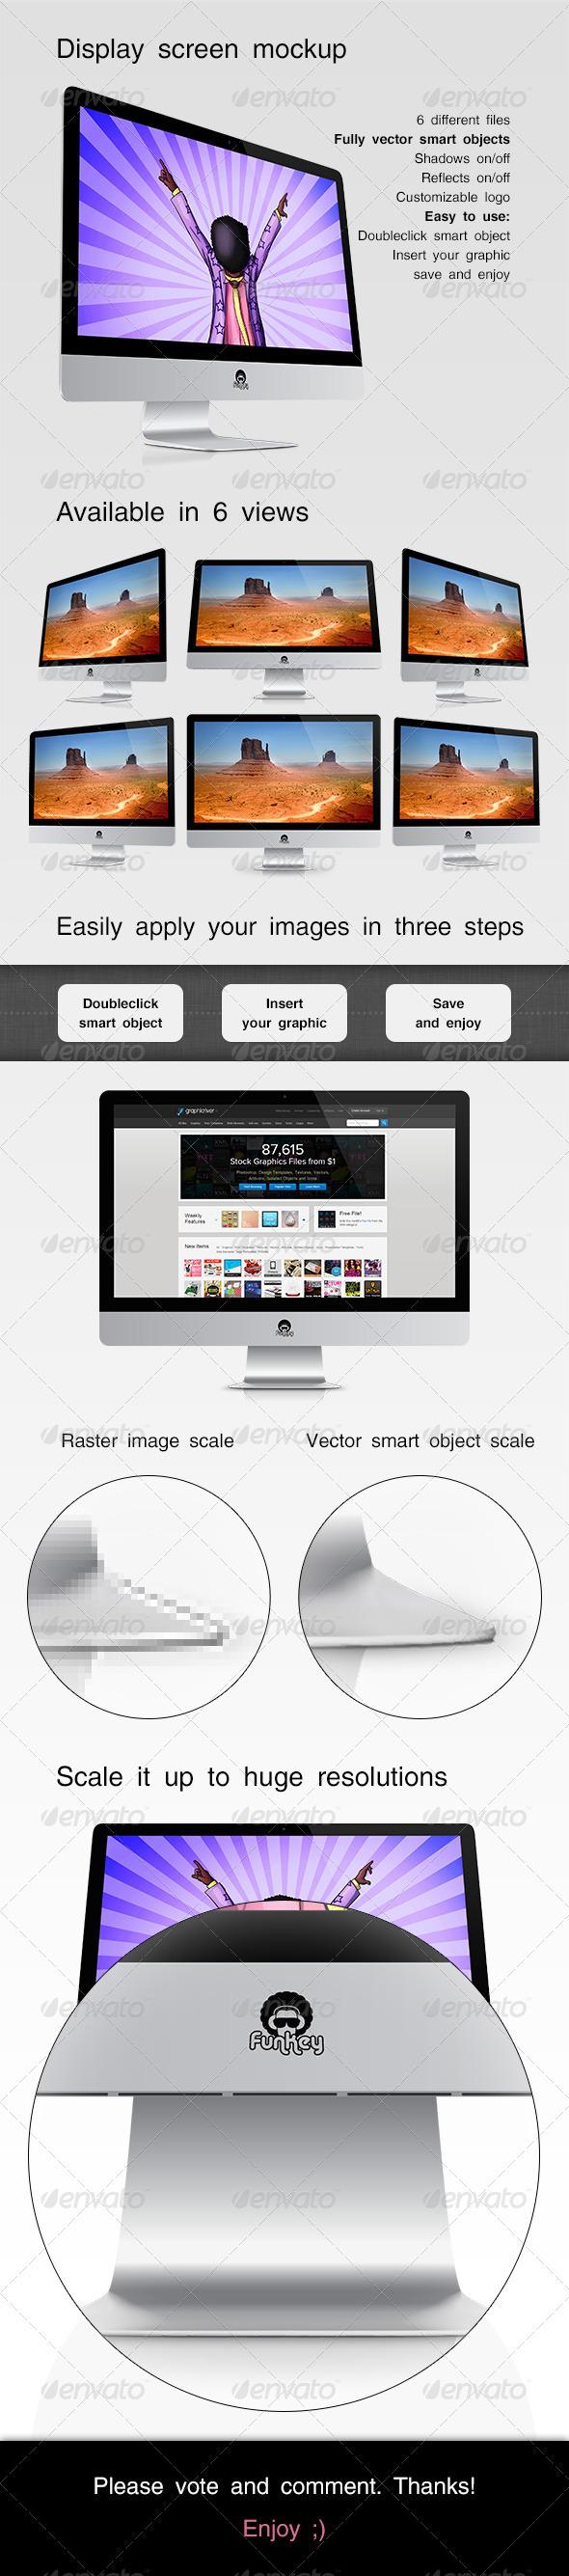 GraphicRiver Display Screen Mockup 3782785